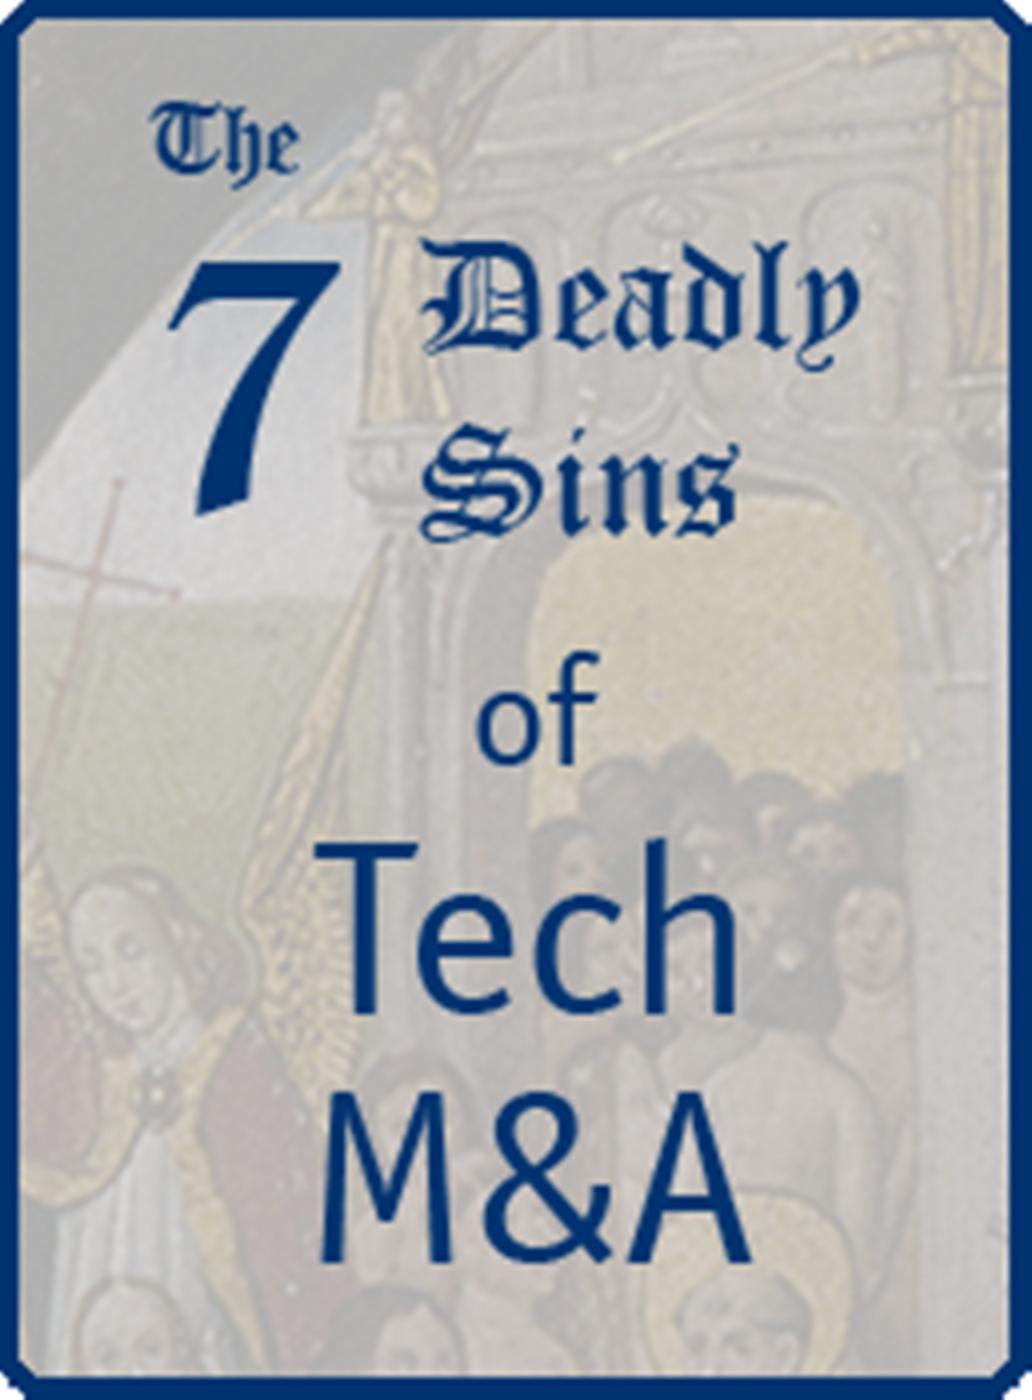 7 Deadly Sins of Tech M&A: #6 & 7